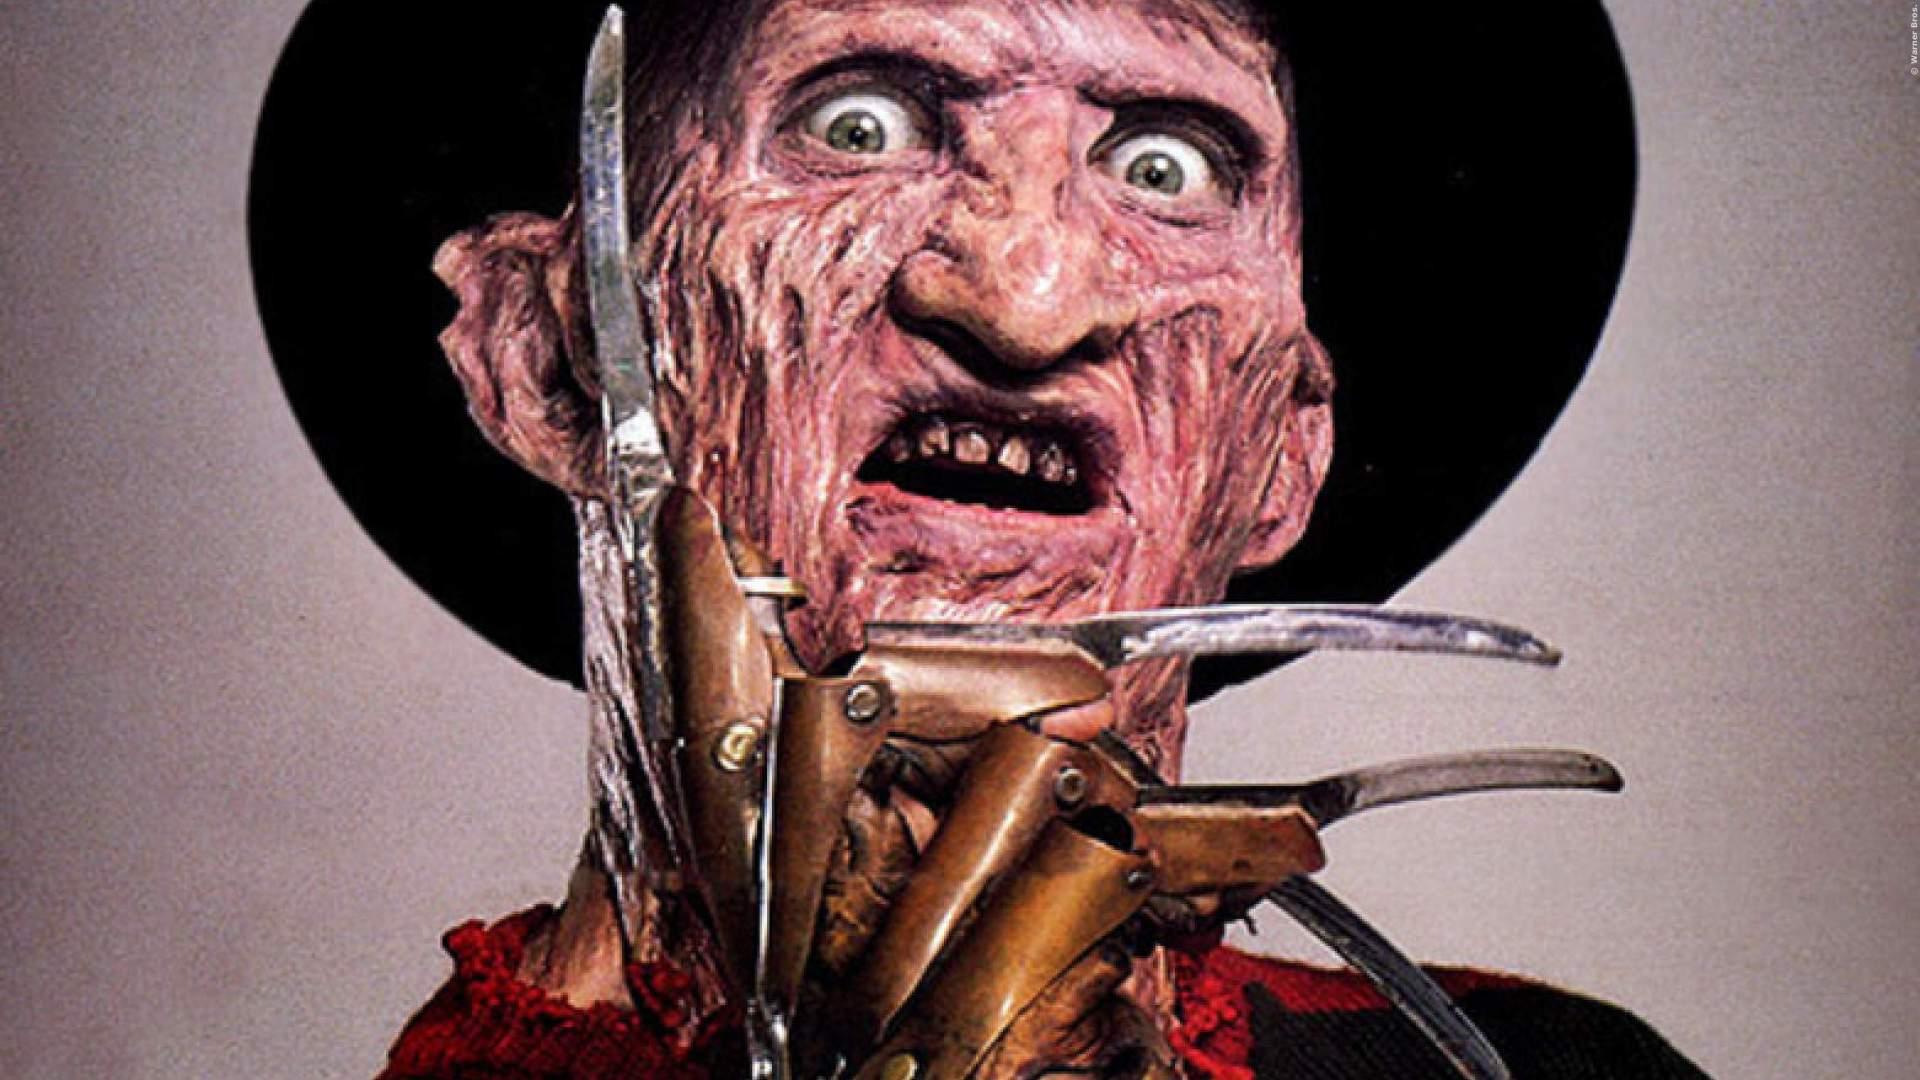 QUIZ: Erkennst du alle Filme am Horror-Monster? Wir wetten dagegen